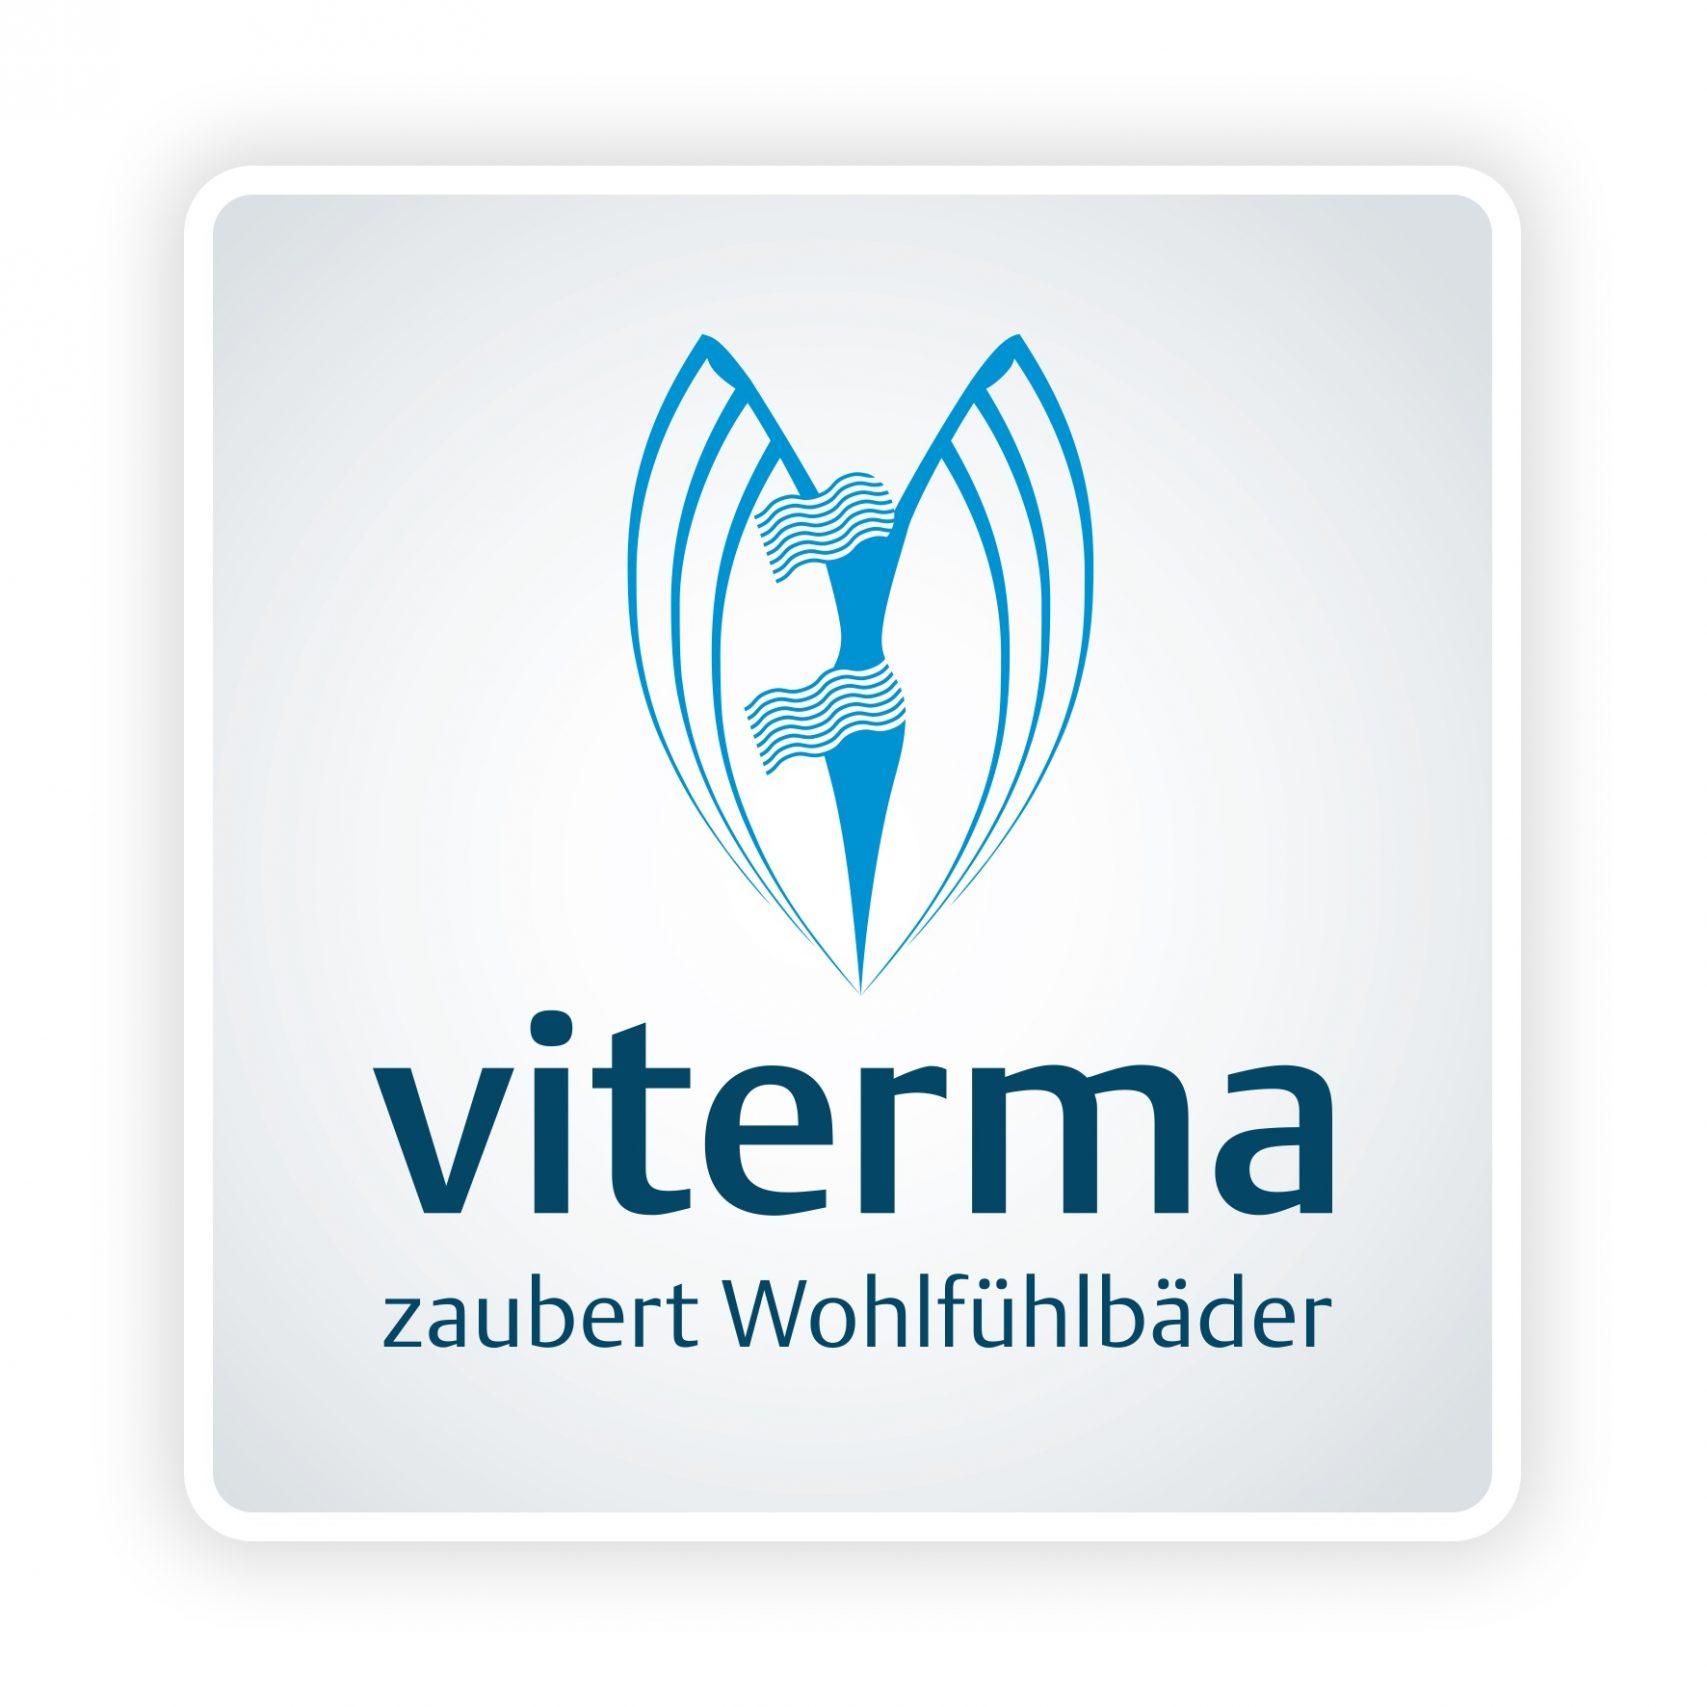 Viterma